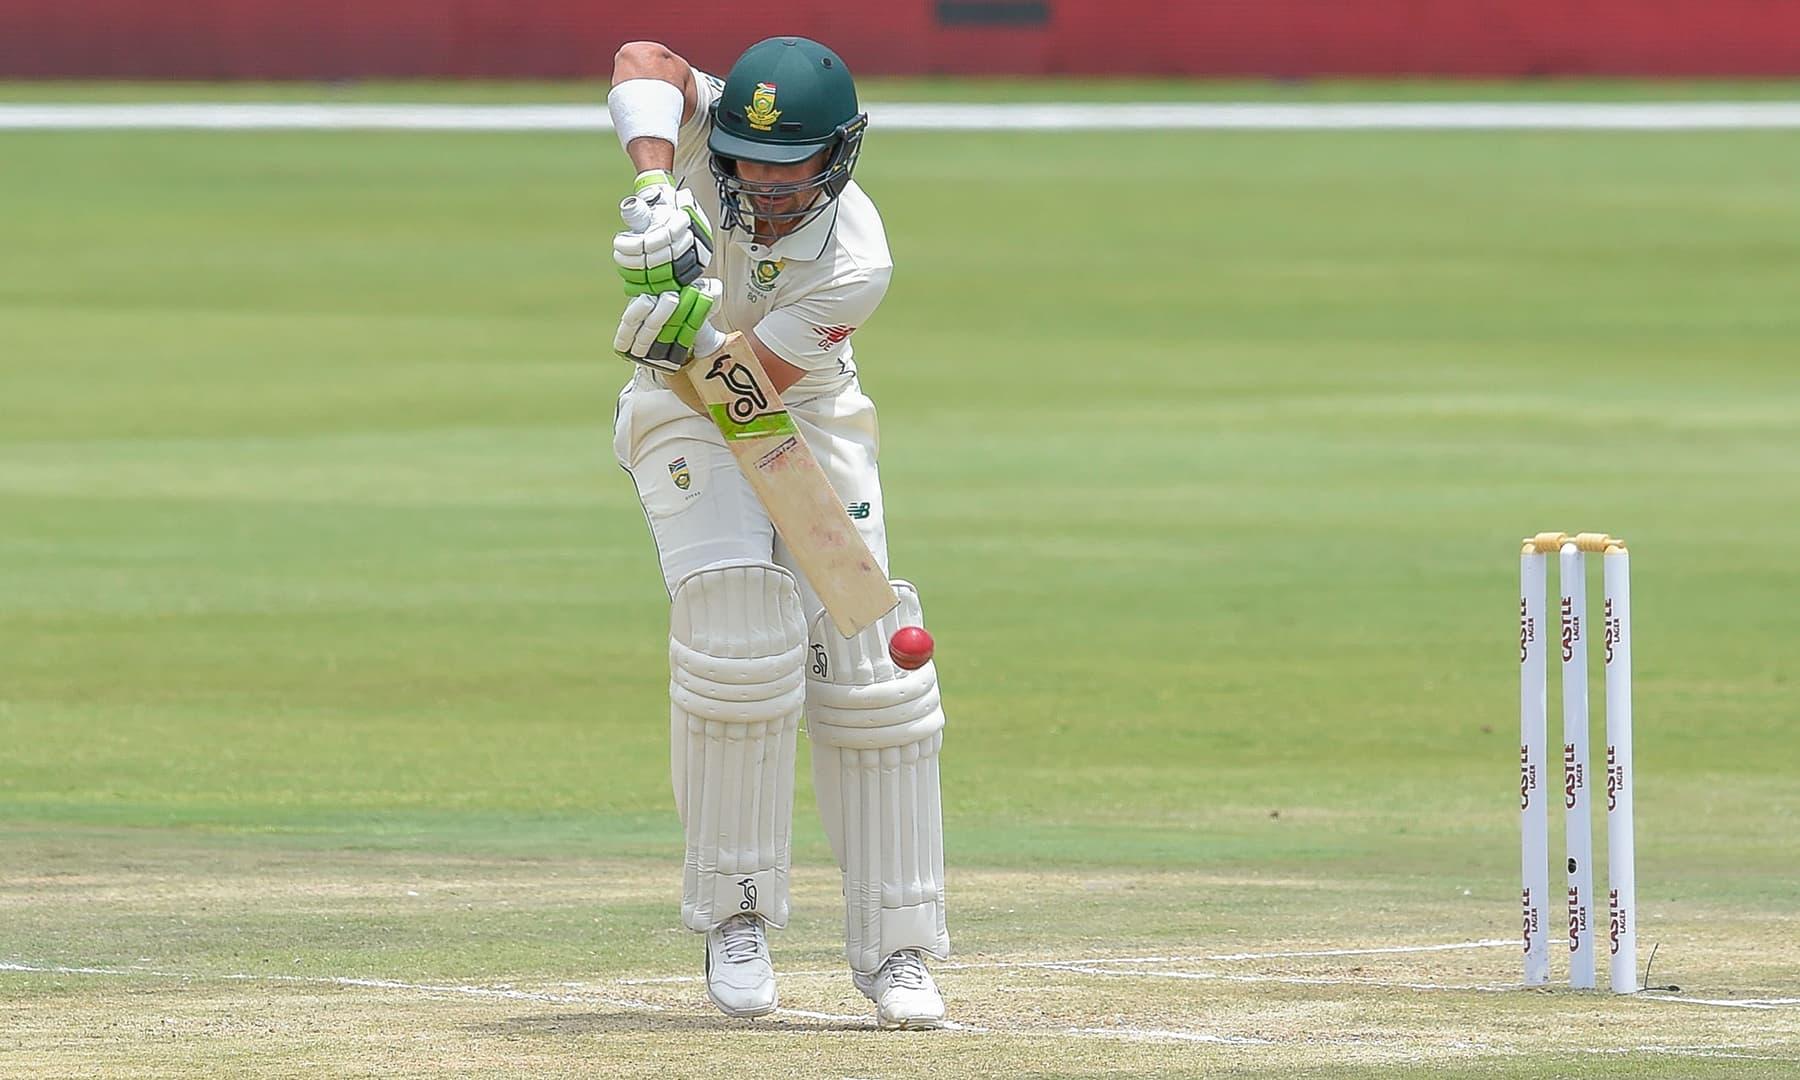 South Africa's Dean Elgar plays a shot. —AFP